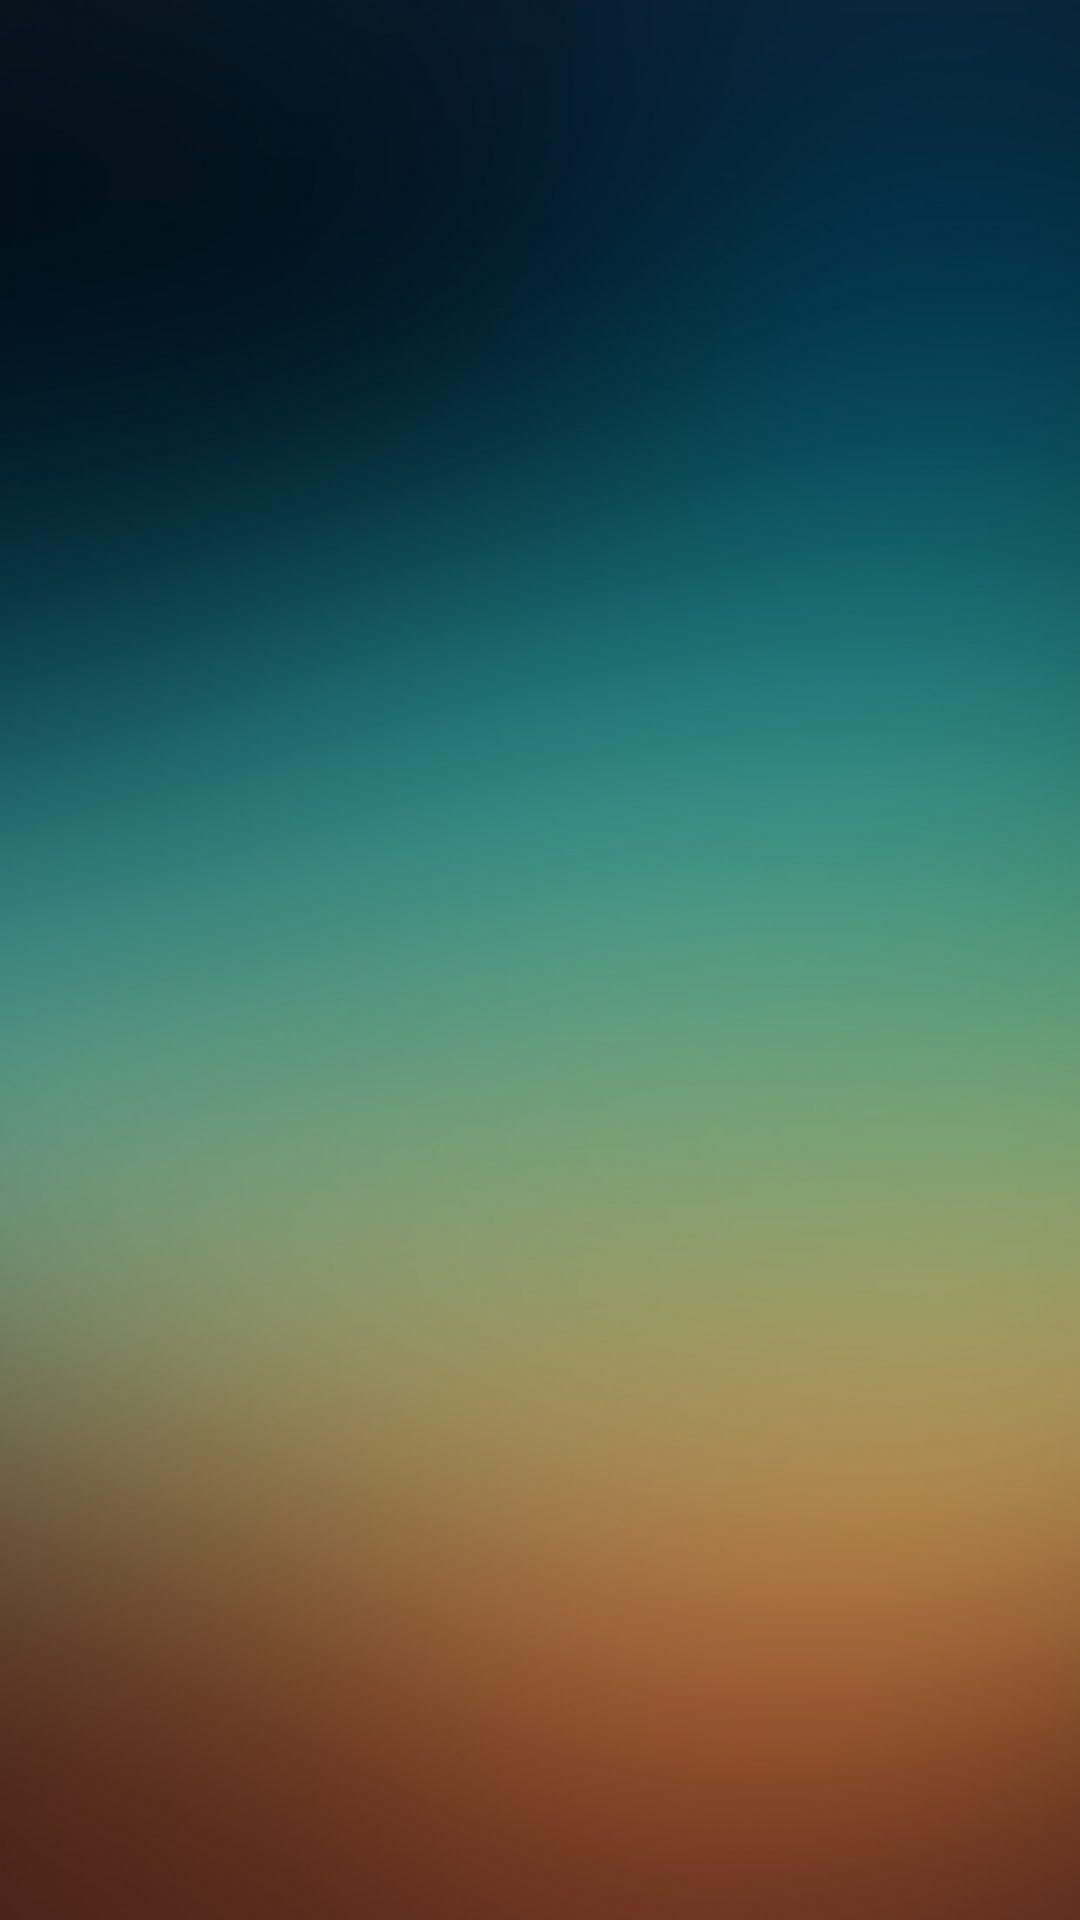 Abstract Morning Gradation Blur